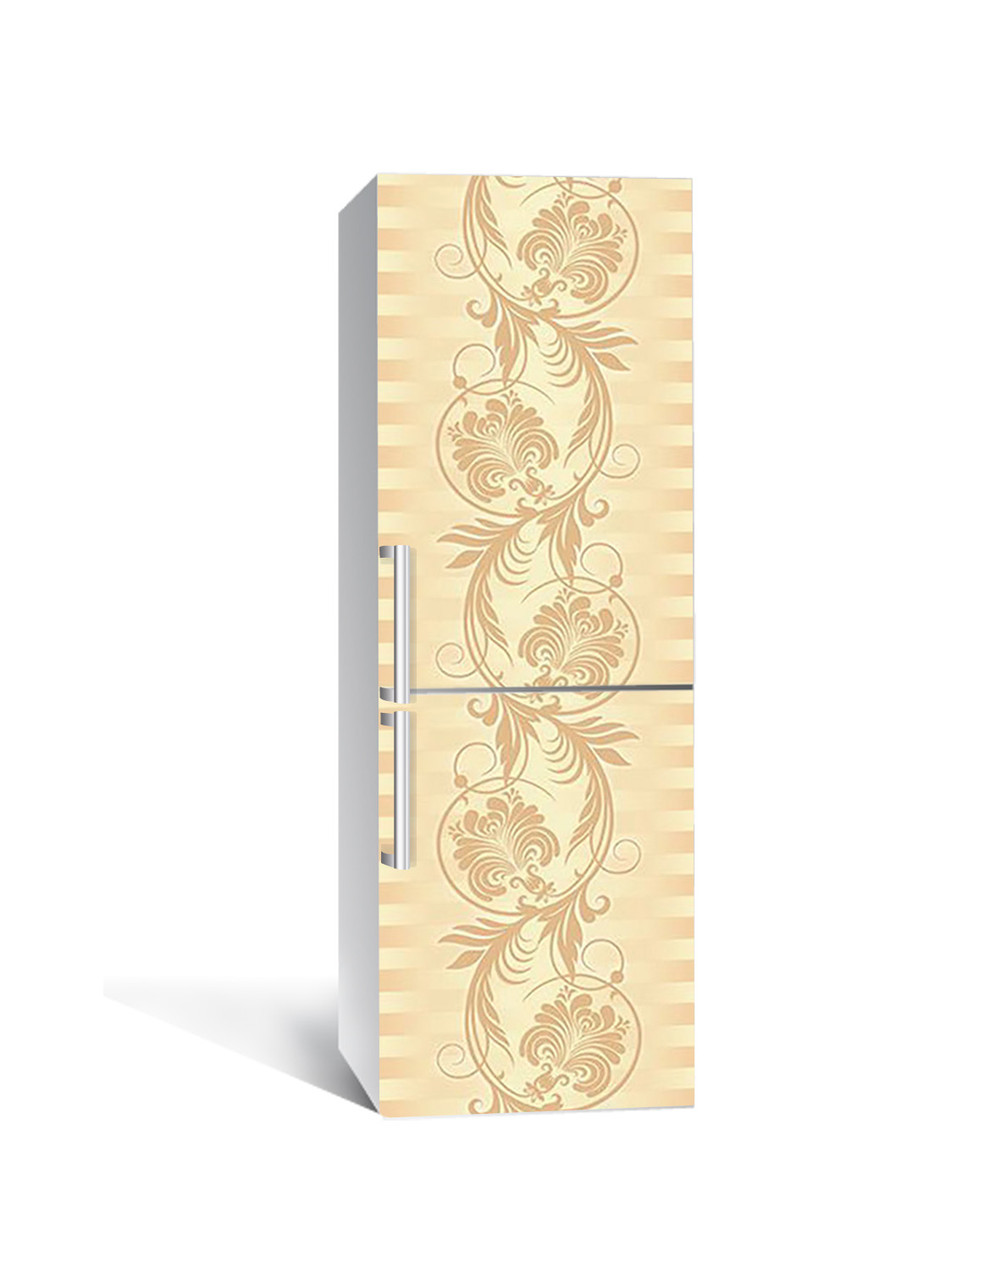 Наклейка на холодильник Zatarga «Перья жар-птицы» 650х2000 мм виниловая 3Д наклейка декор на кухню